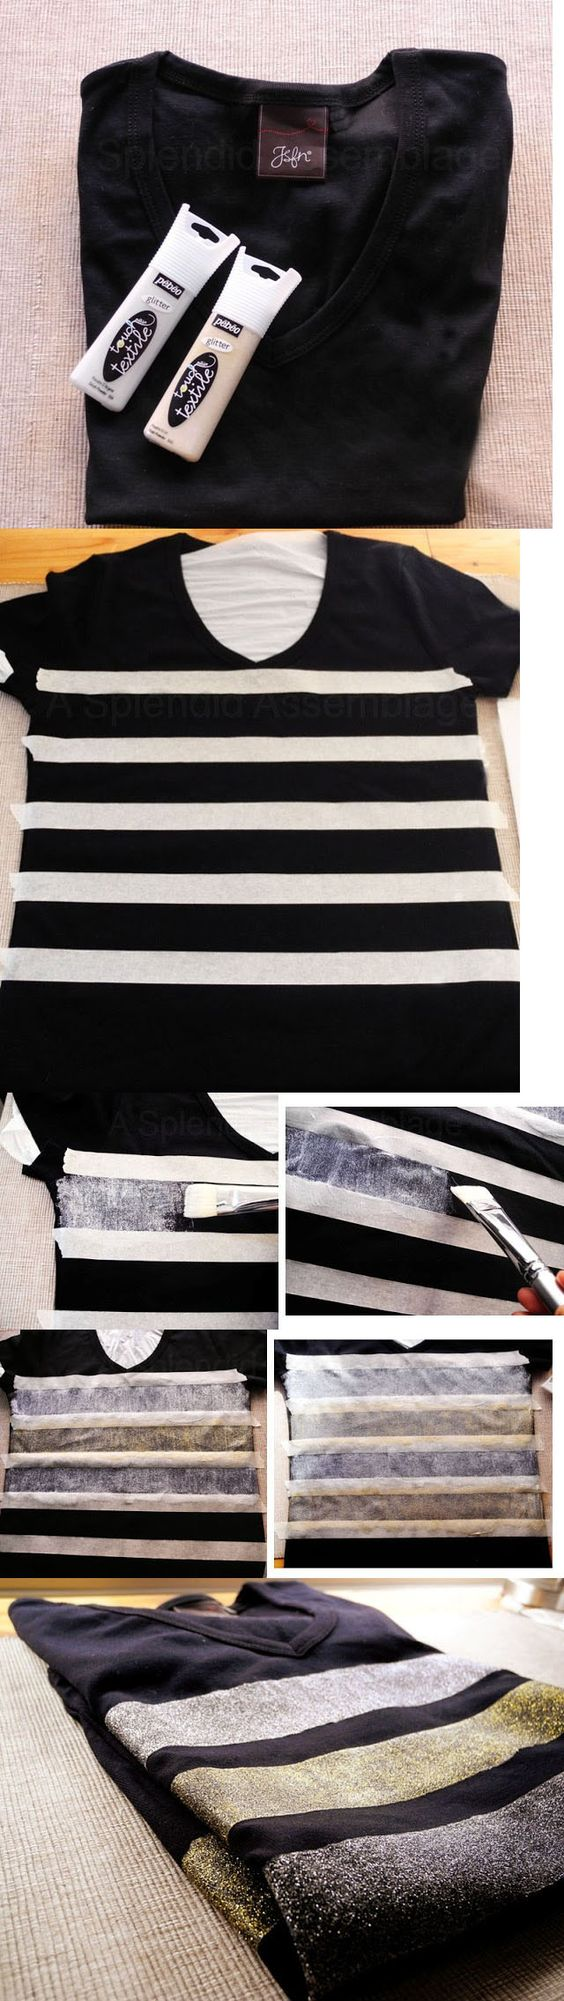 DIY Clothes: